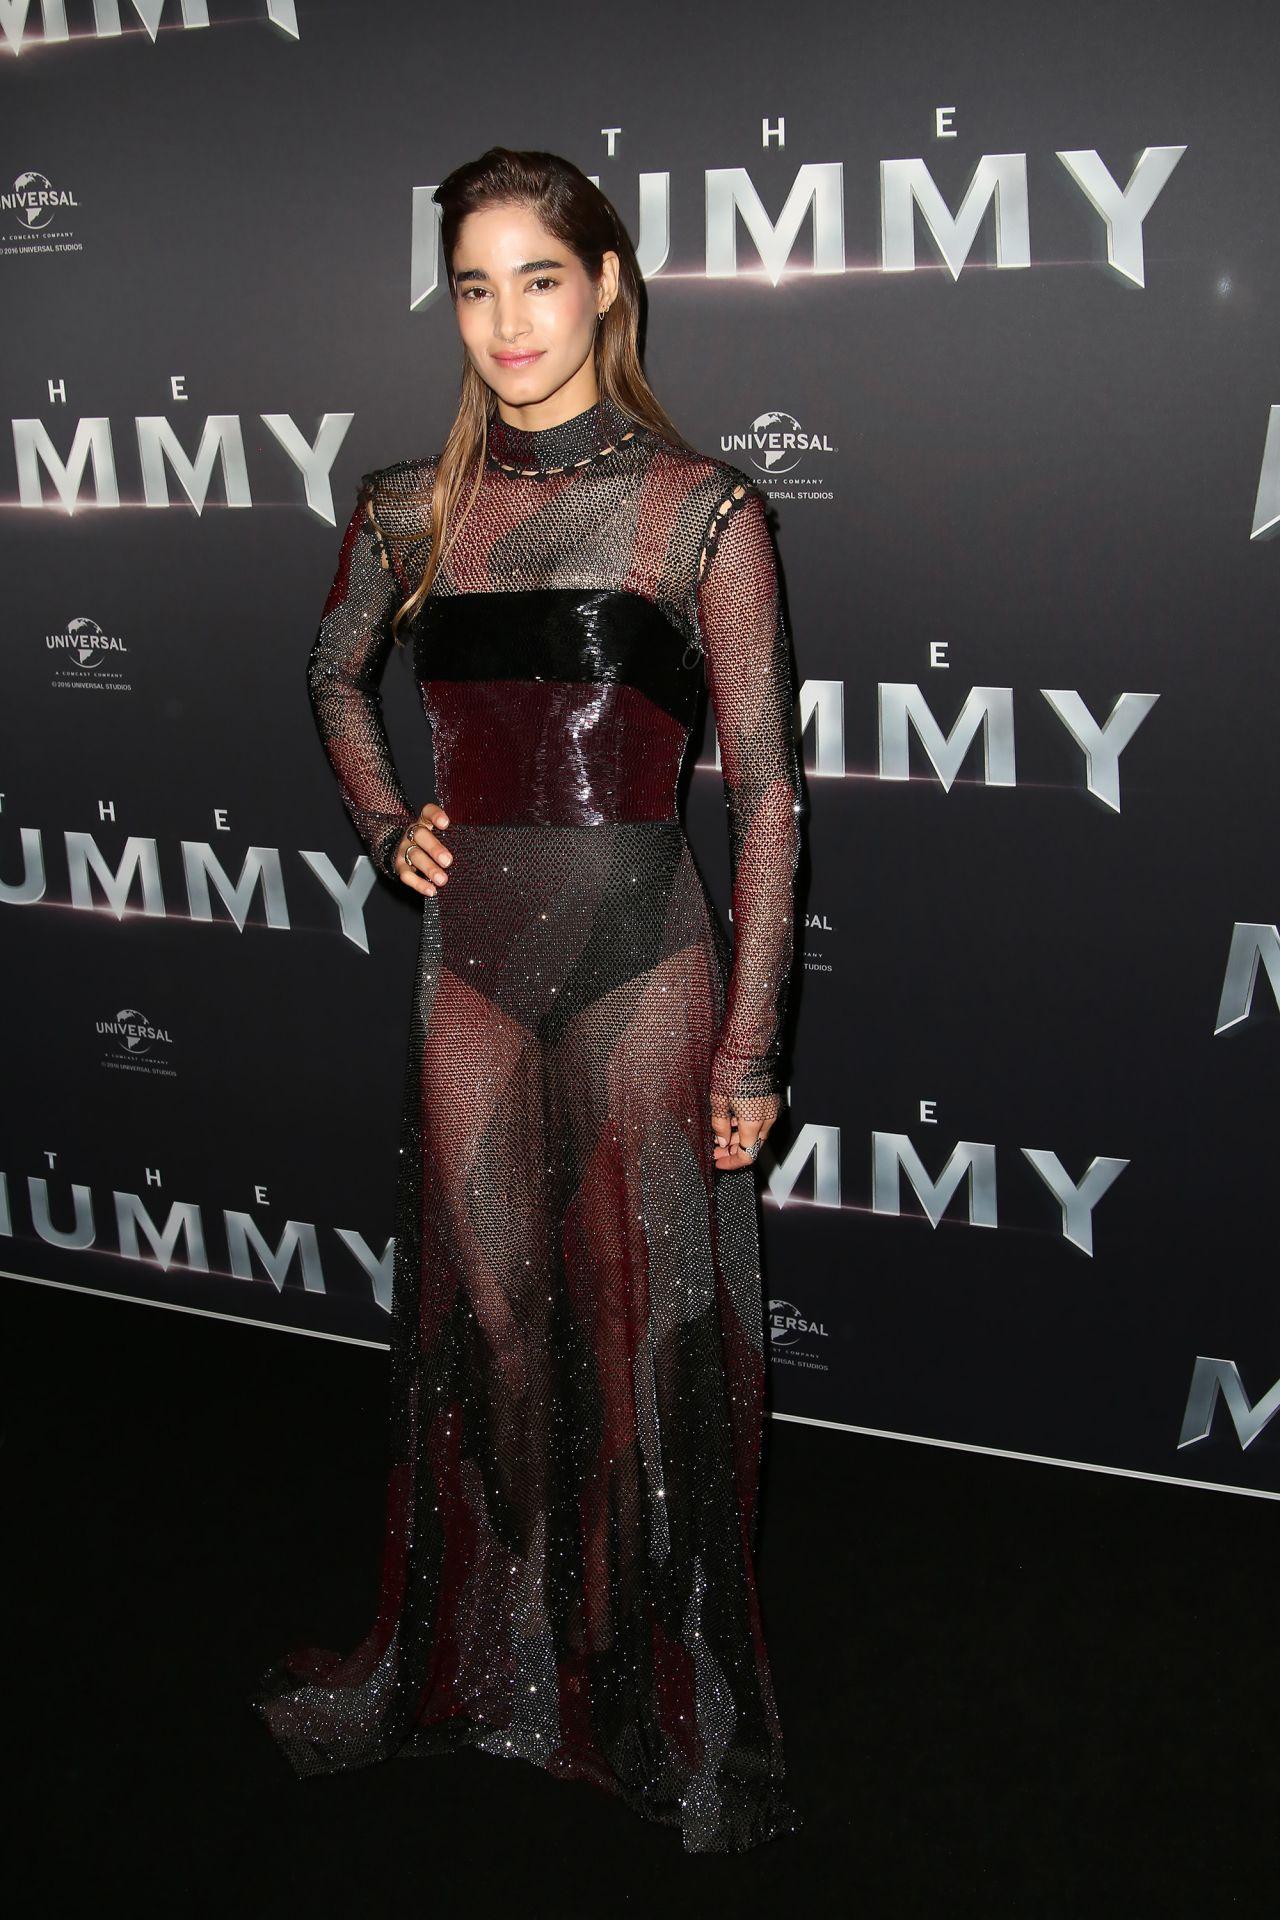 http://celebmafia.com/wp-content/uploads/2017/05/sofia-boutella-the-mummy-premiere-in-sydney-05-22-2017-8.jpg